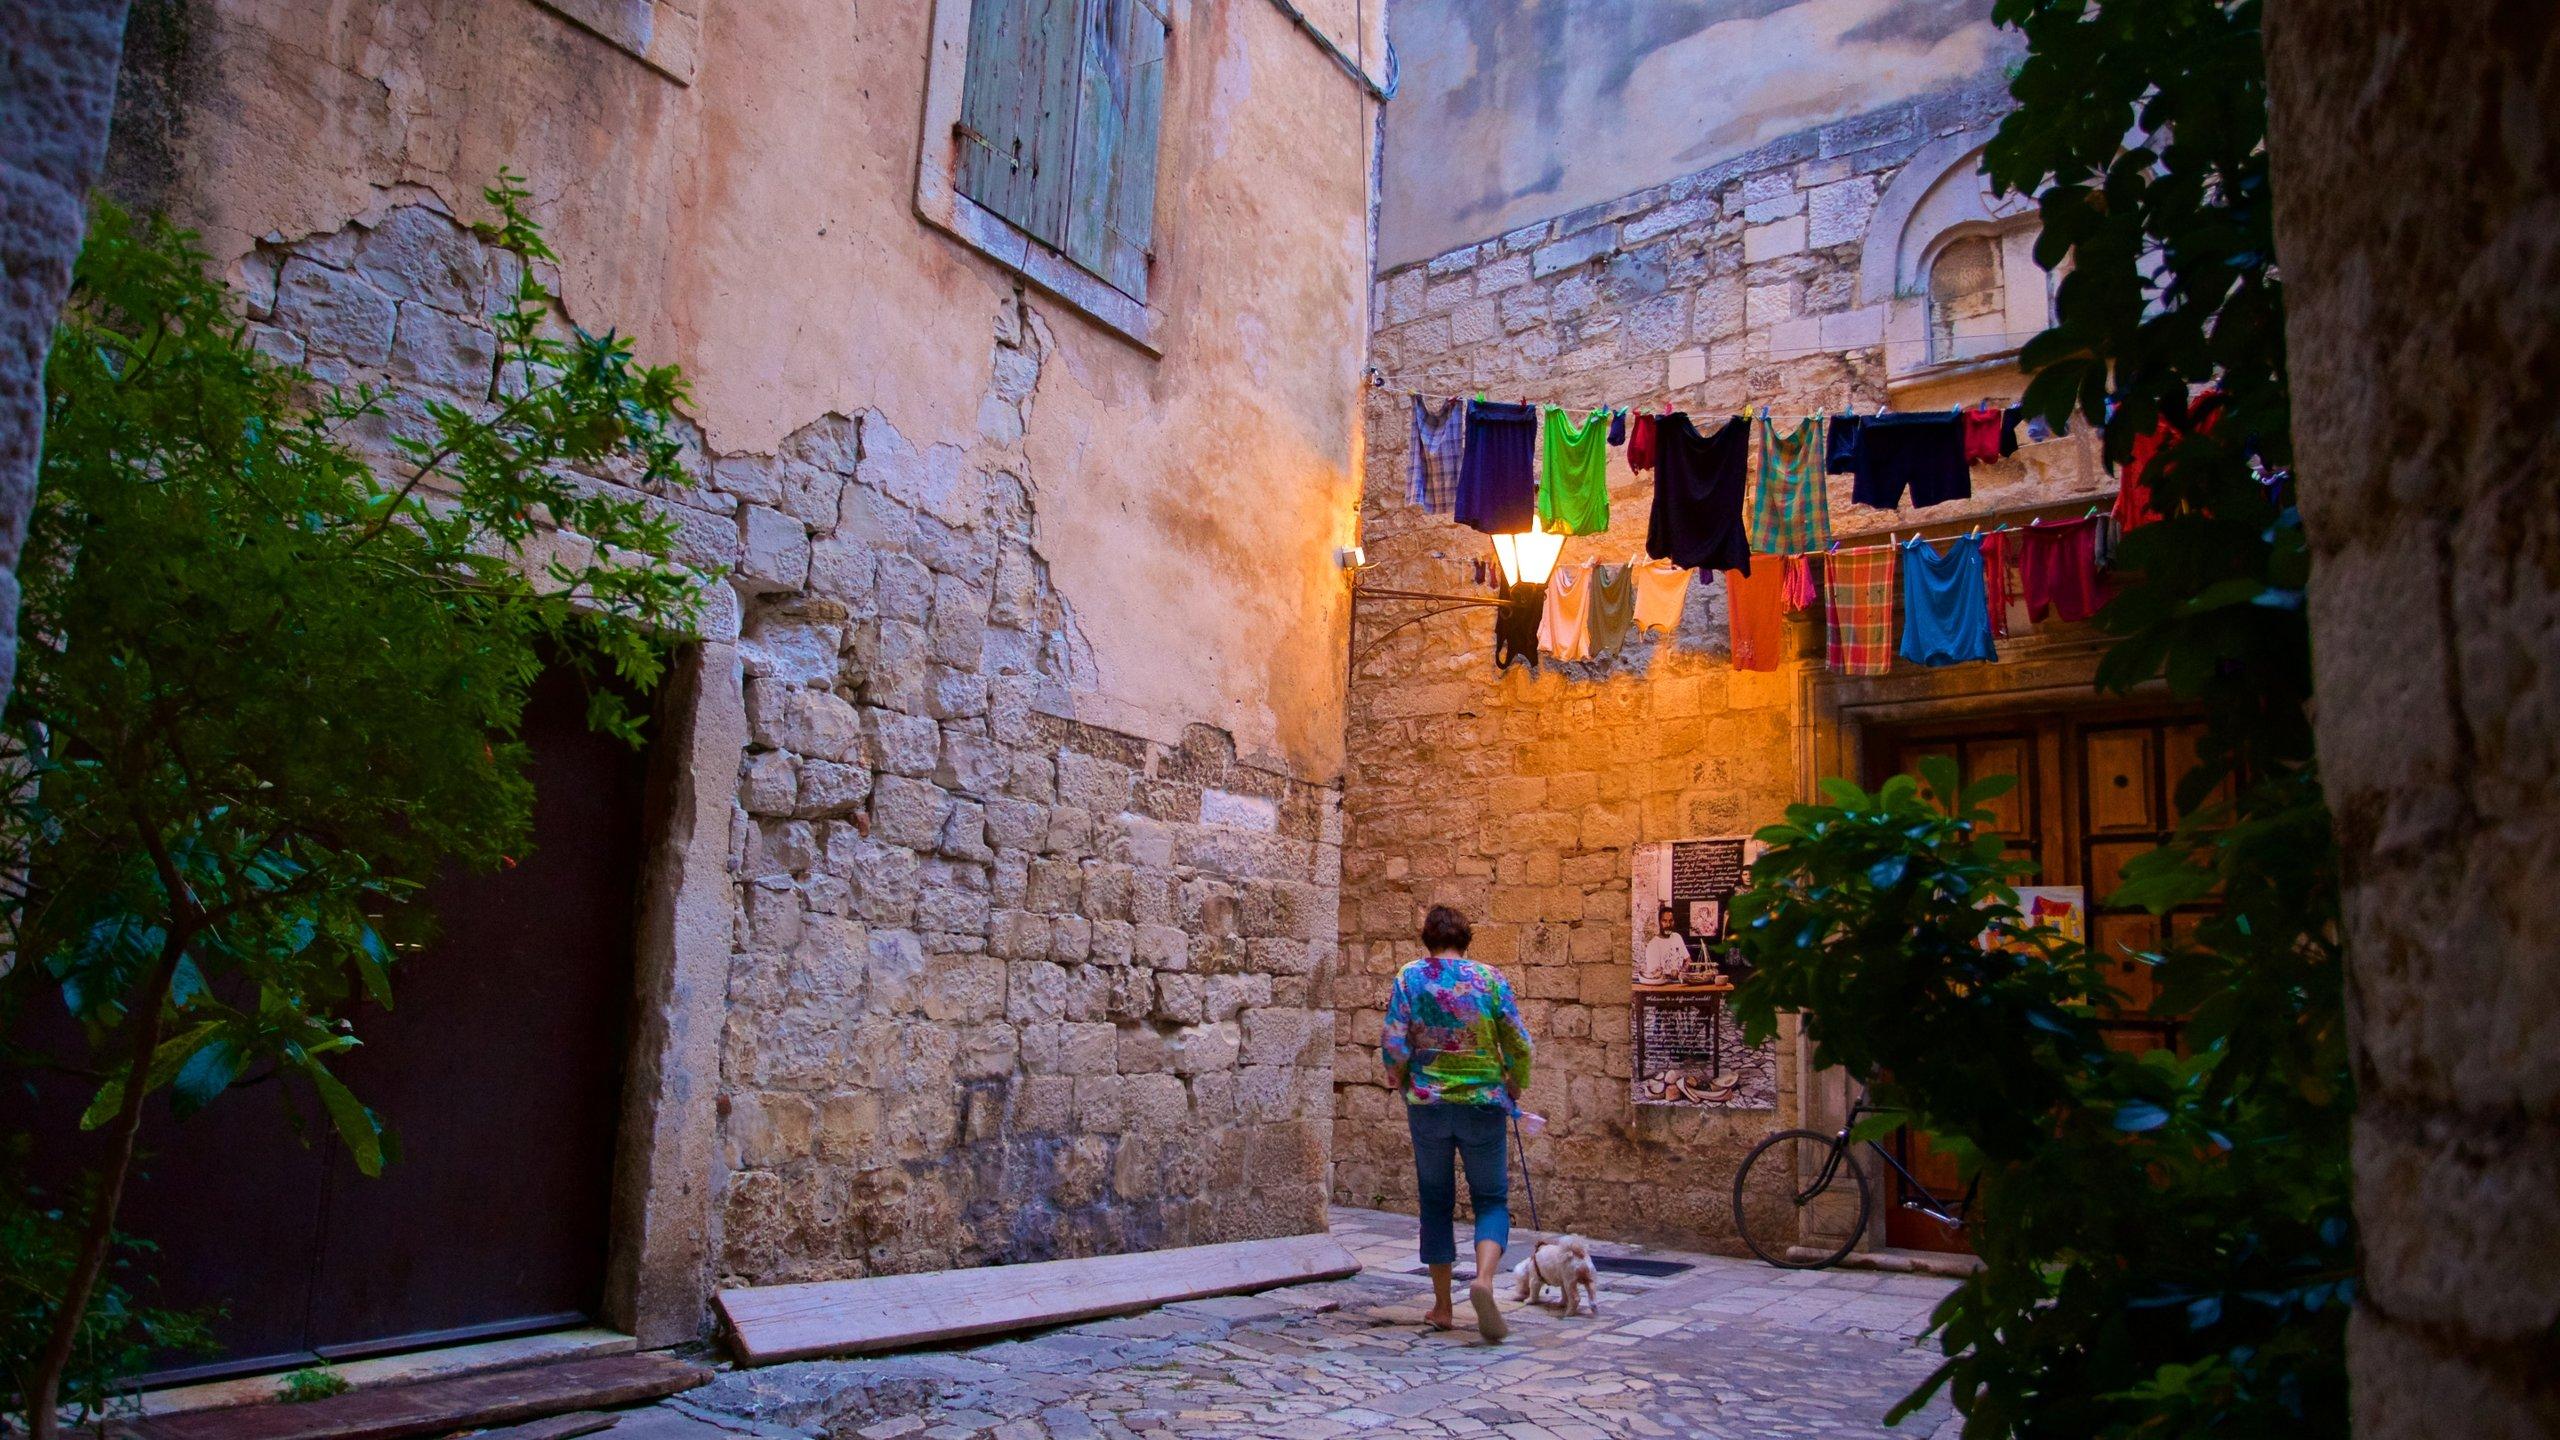 Municipality of Trogir, Split-Dalmatia, Croatia